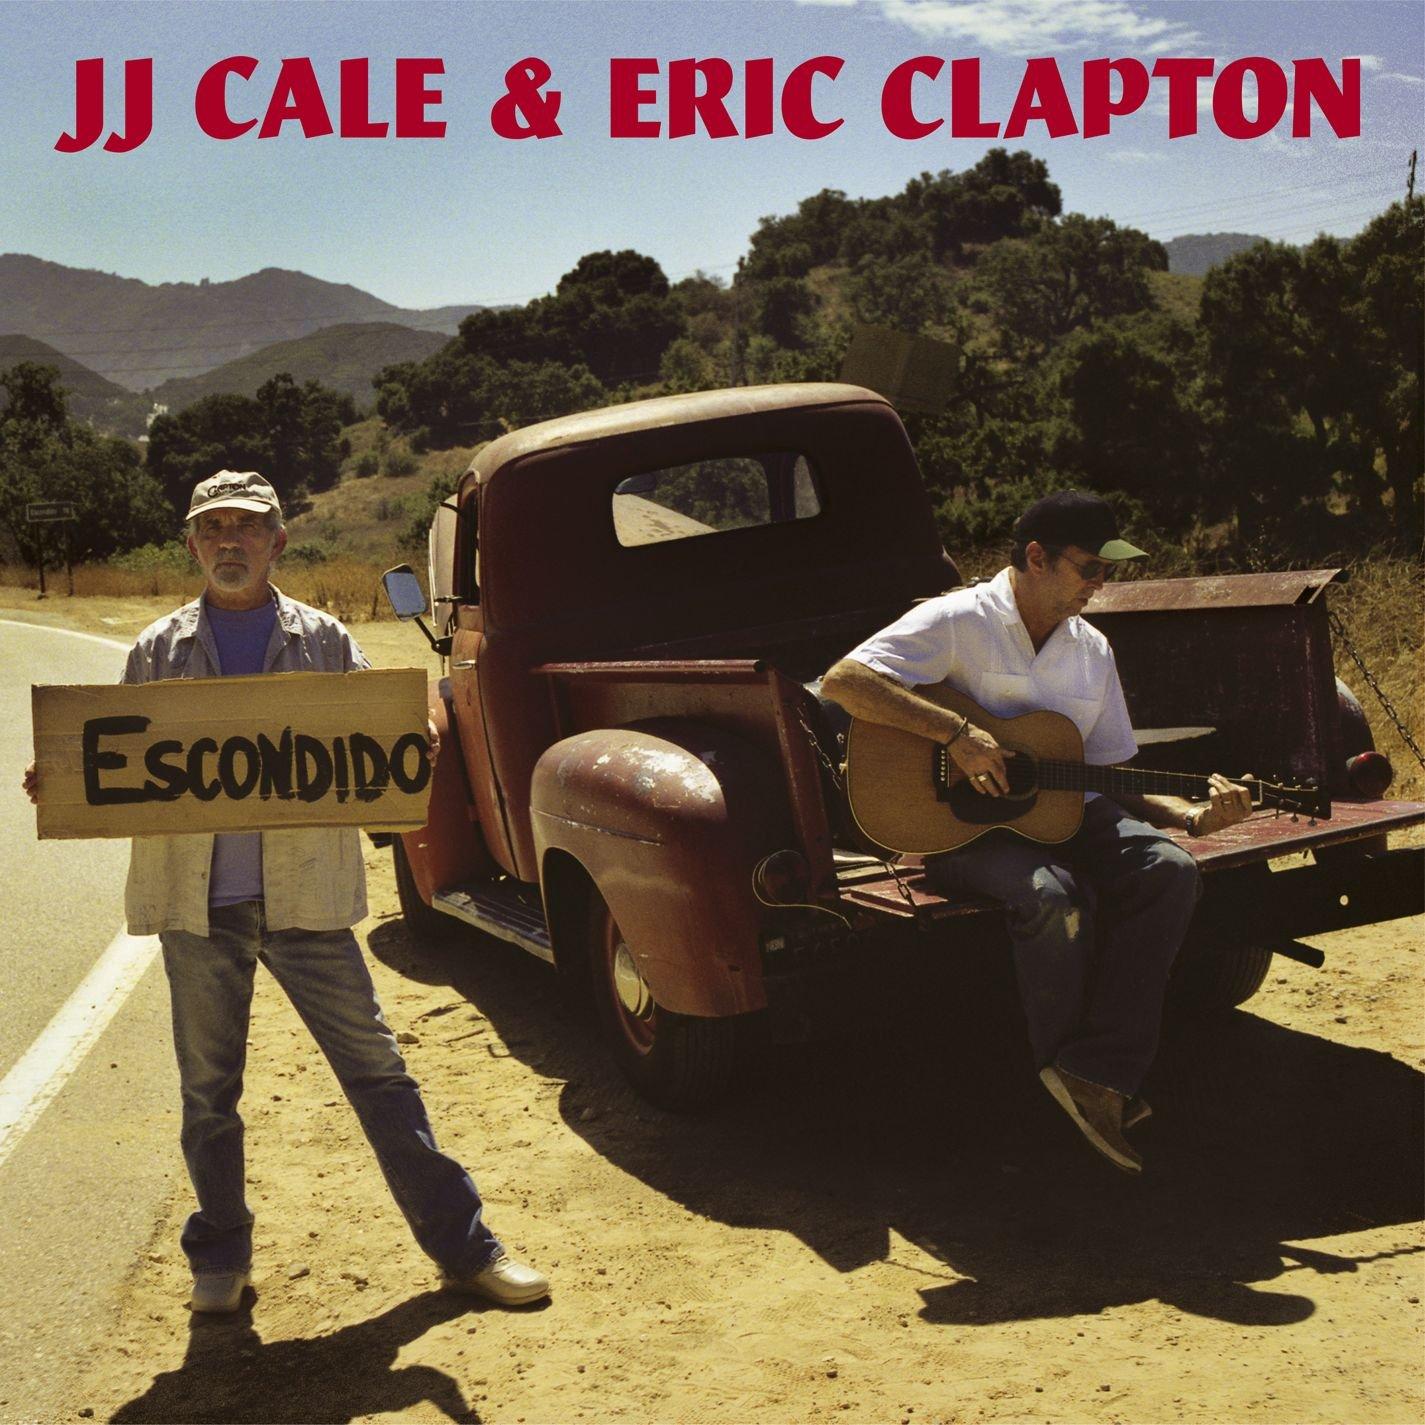 ROAD TO ESCONDIDO, THE [Vinyl]